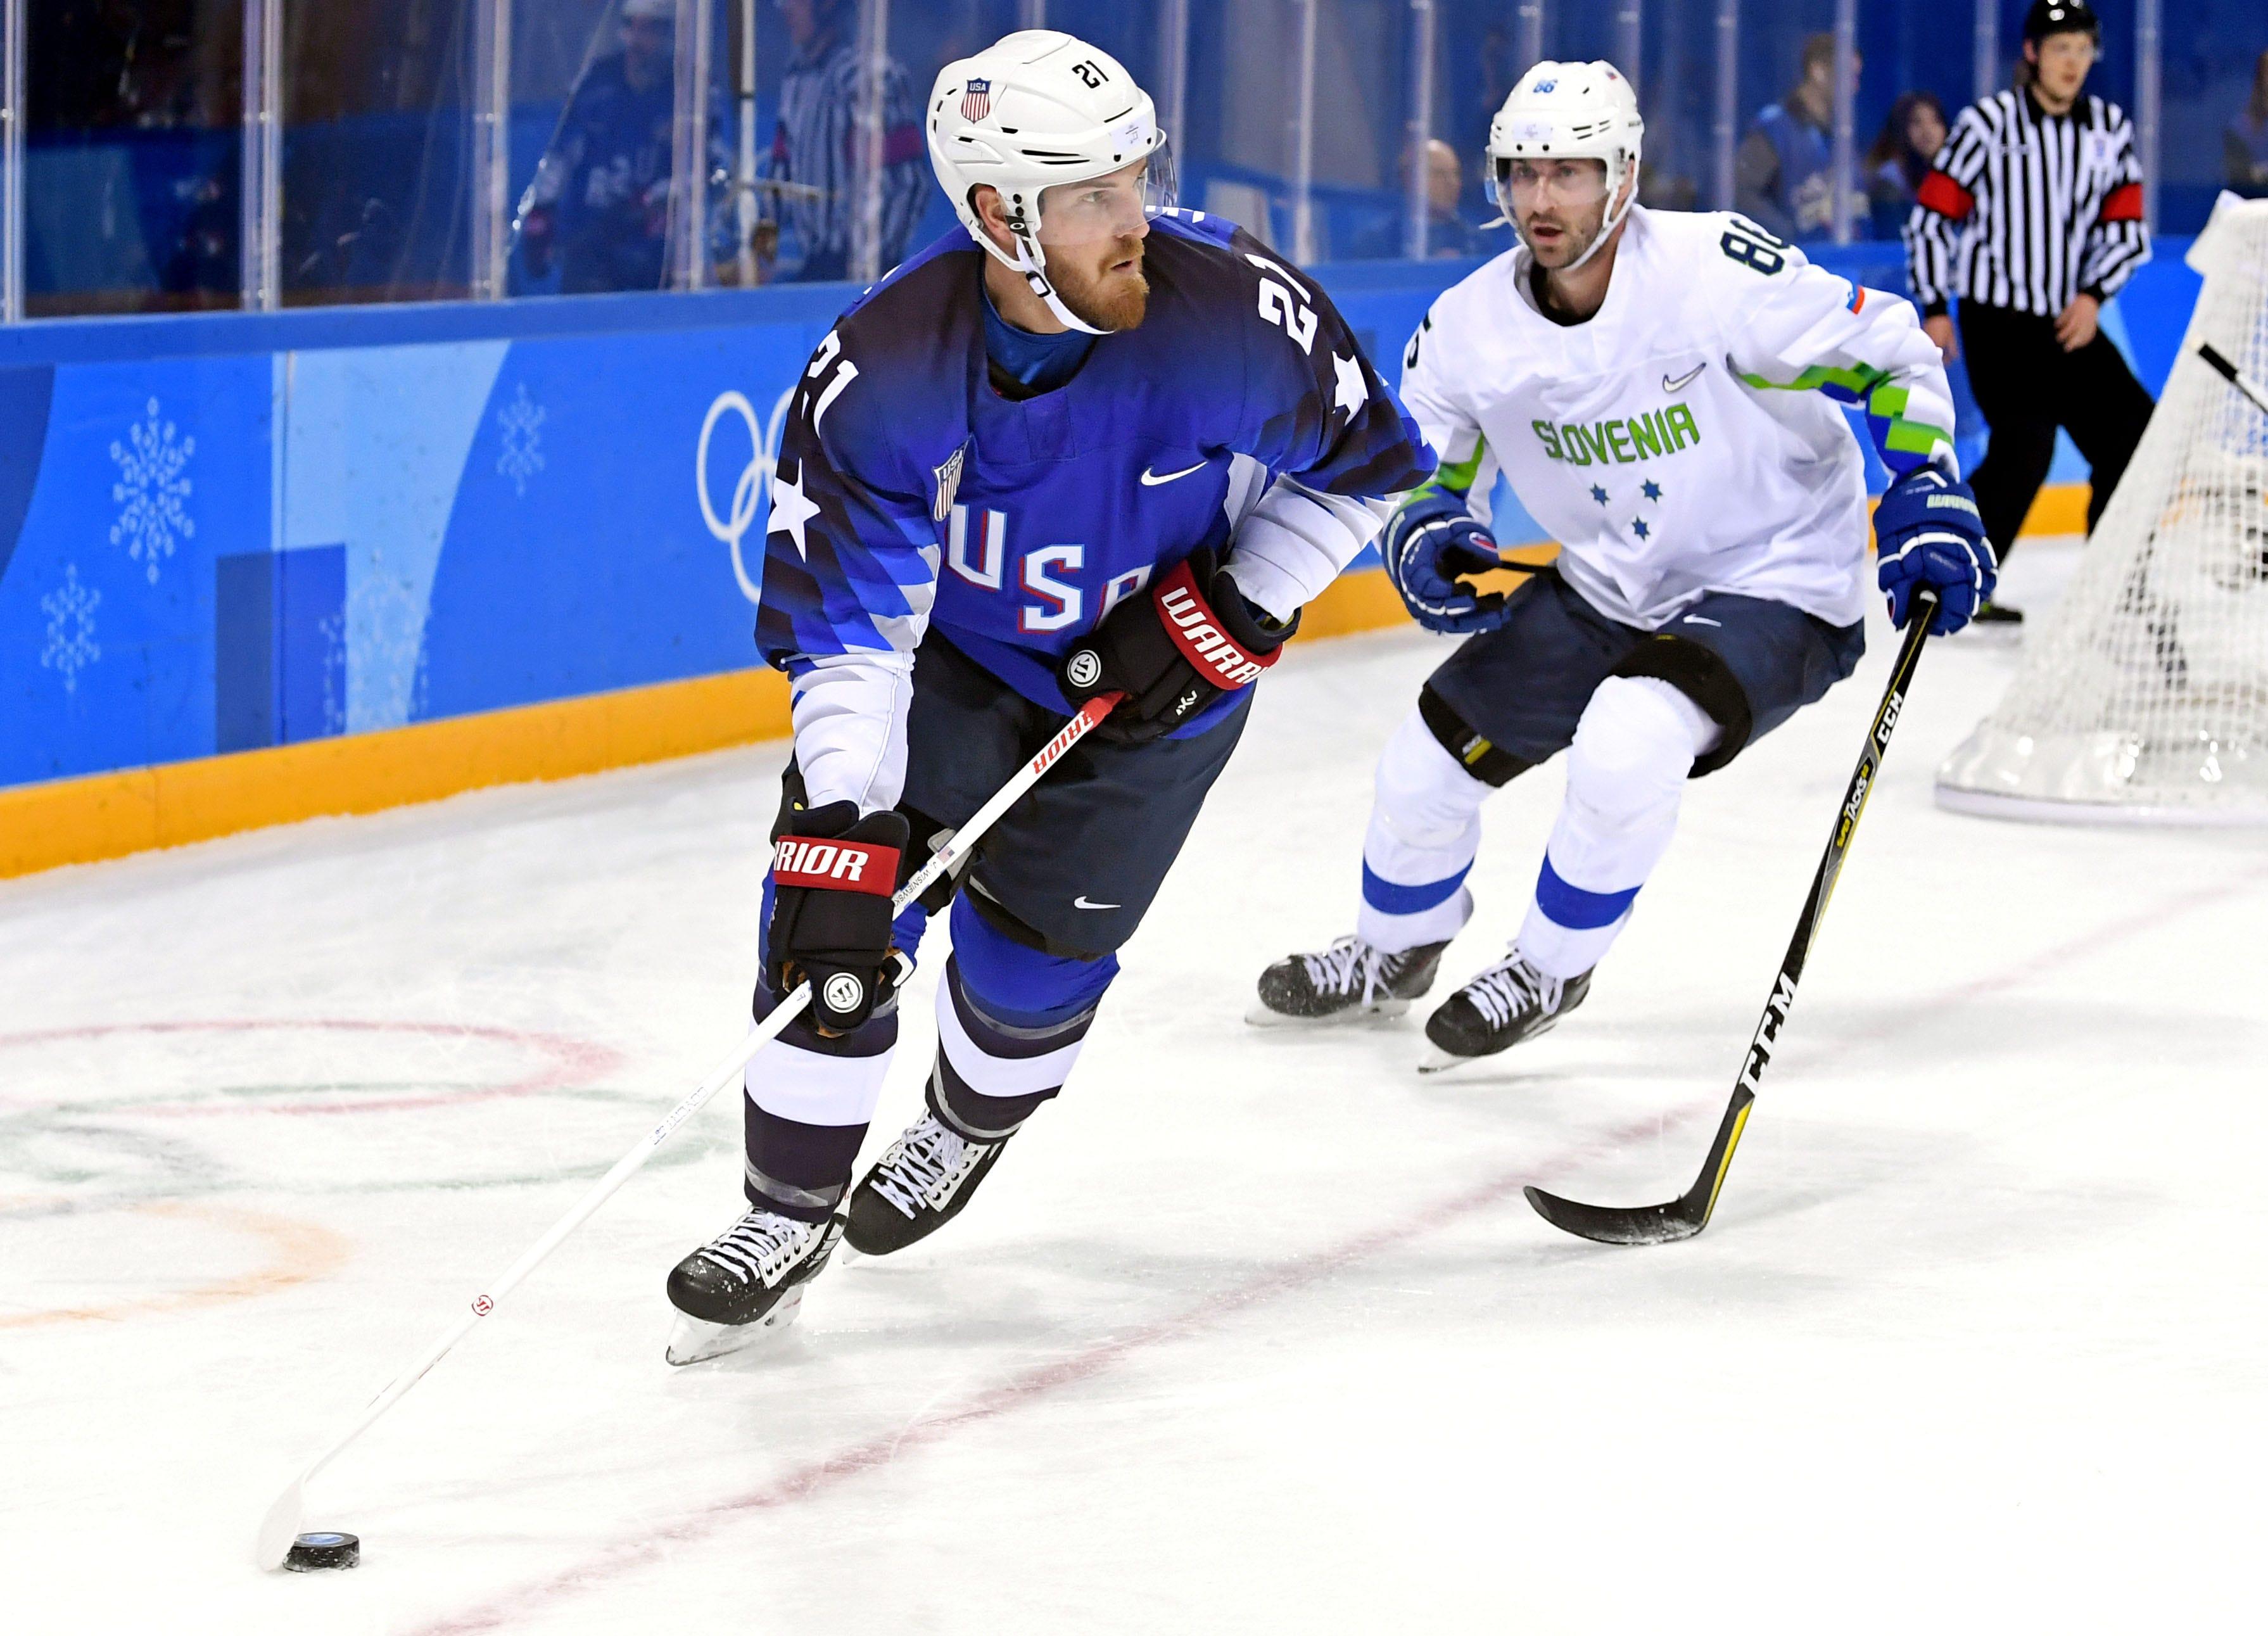 us-hockey-player-james-wisniewski-amp;aposs-father-diagnosed-with-norovirus-at-winter-olympics